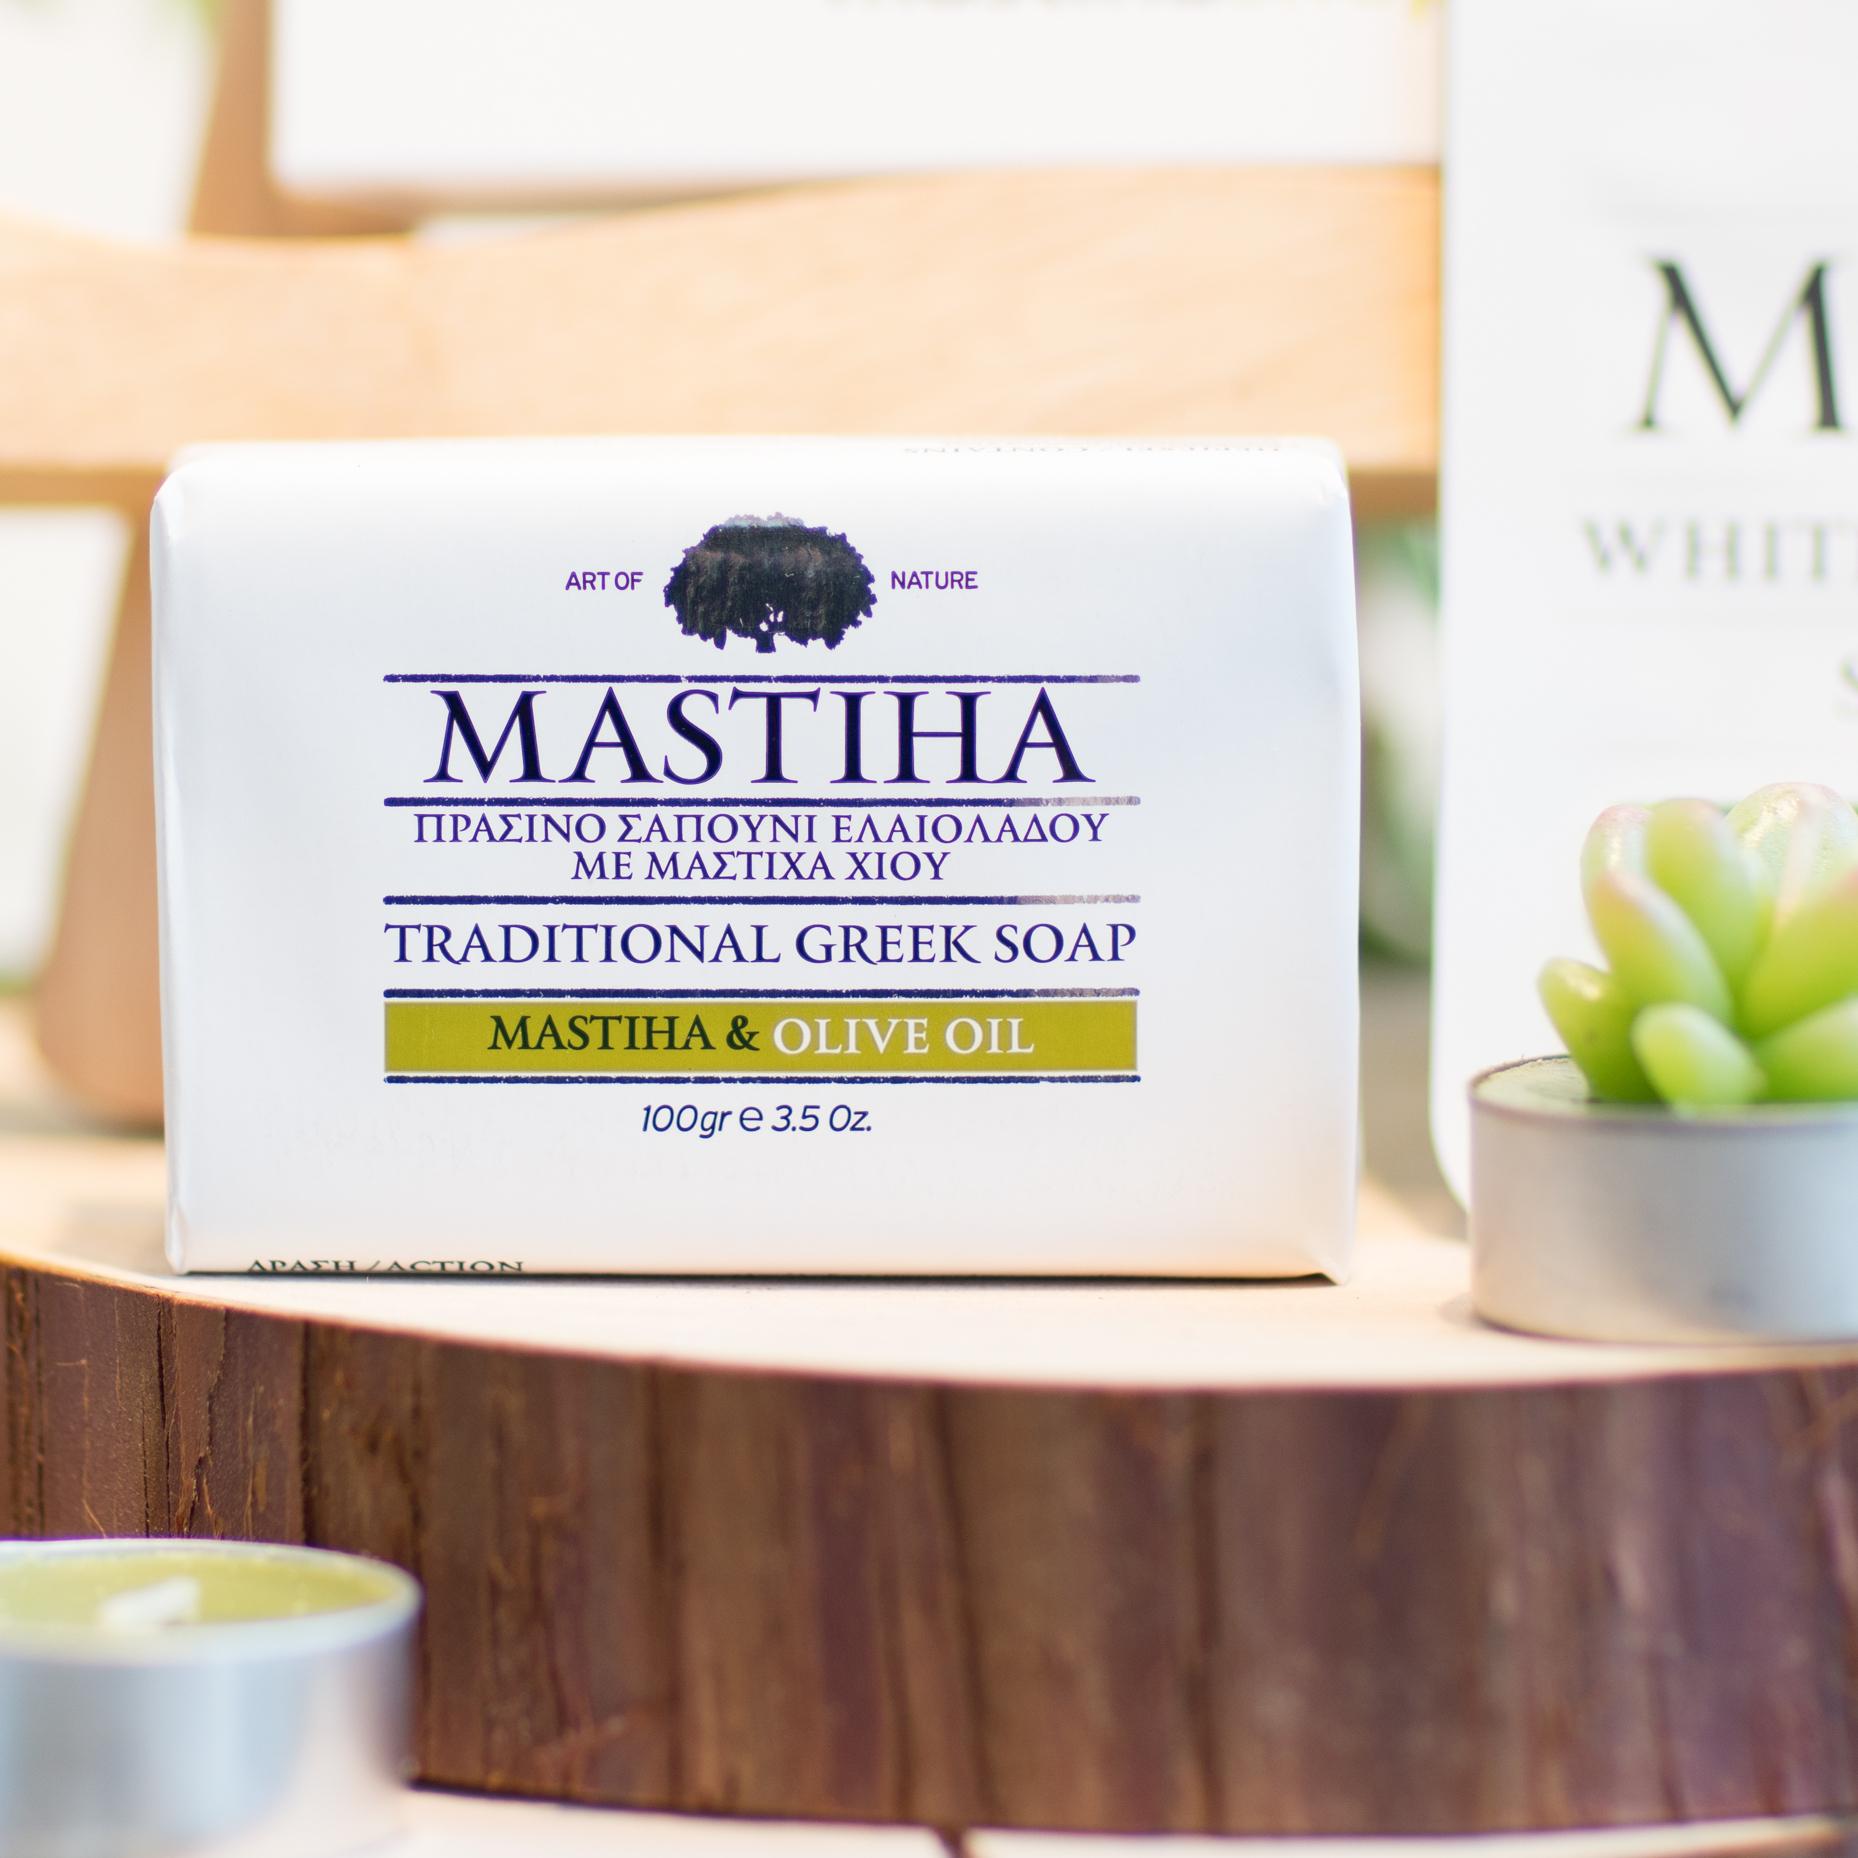 MASTIHA(マスティハ)トラディショナルギリシャソープ